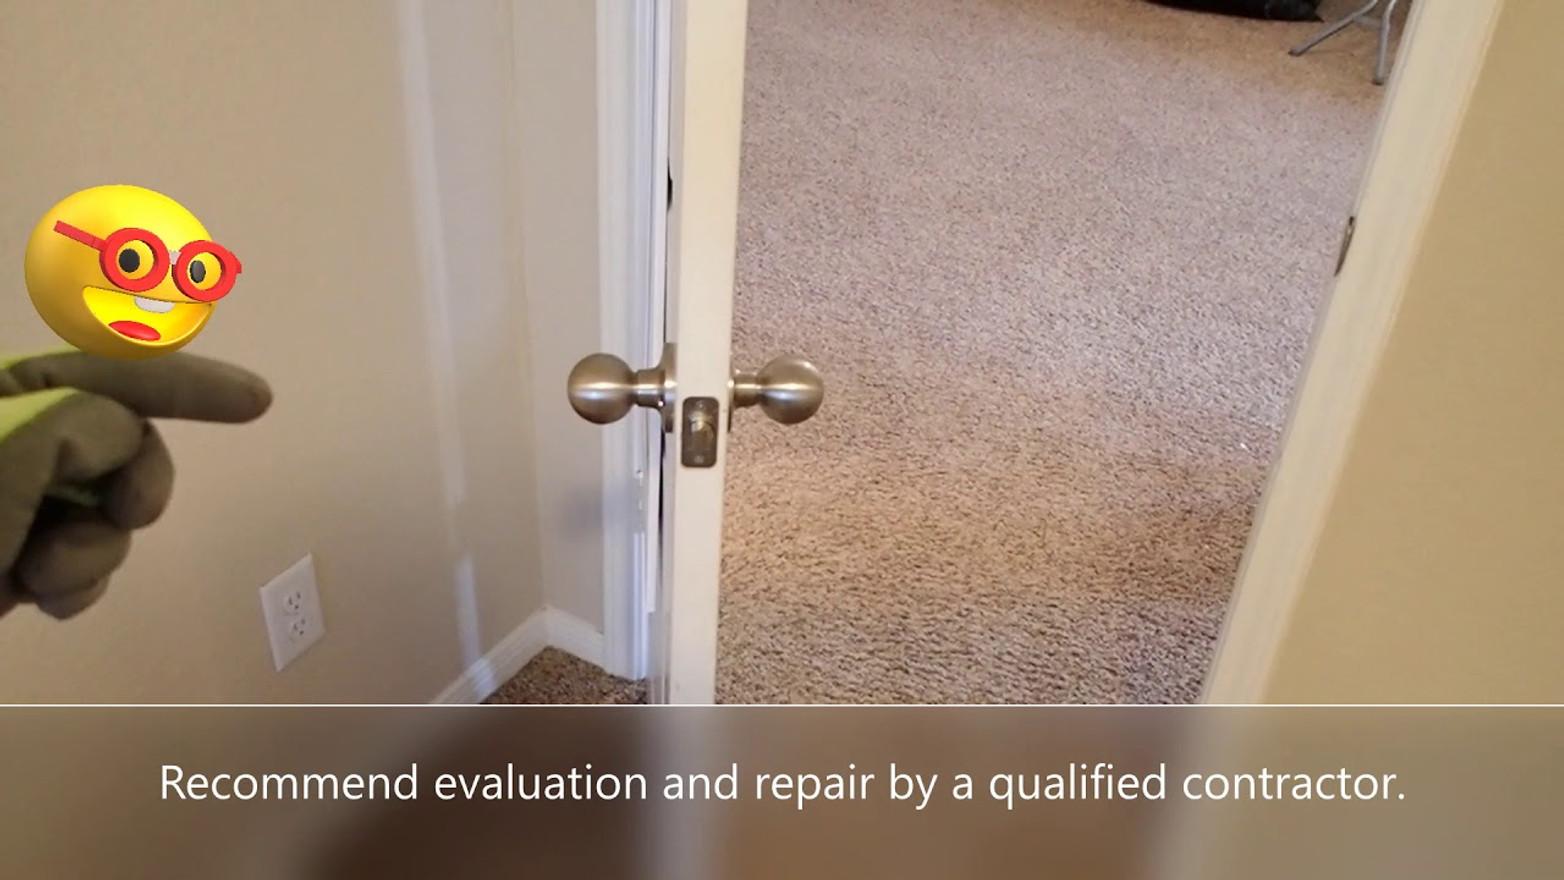 Door Swing Freely - Houston Home Inspection at Houston Texas